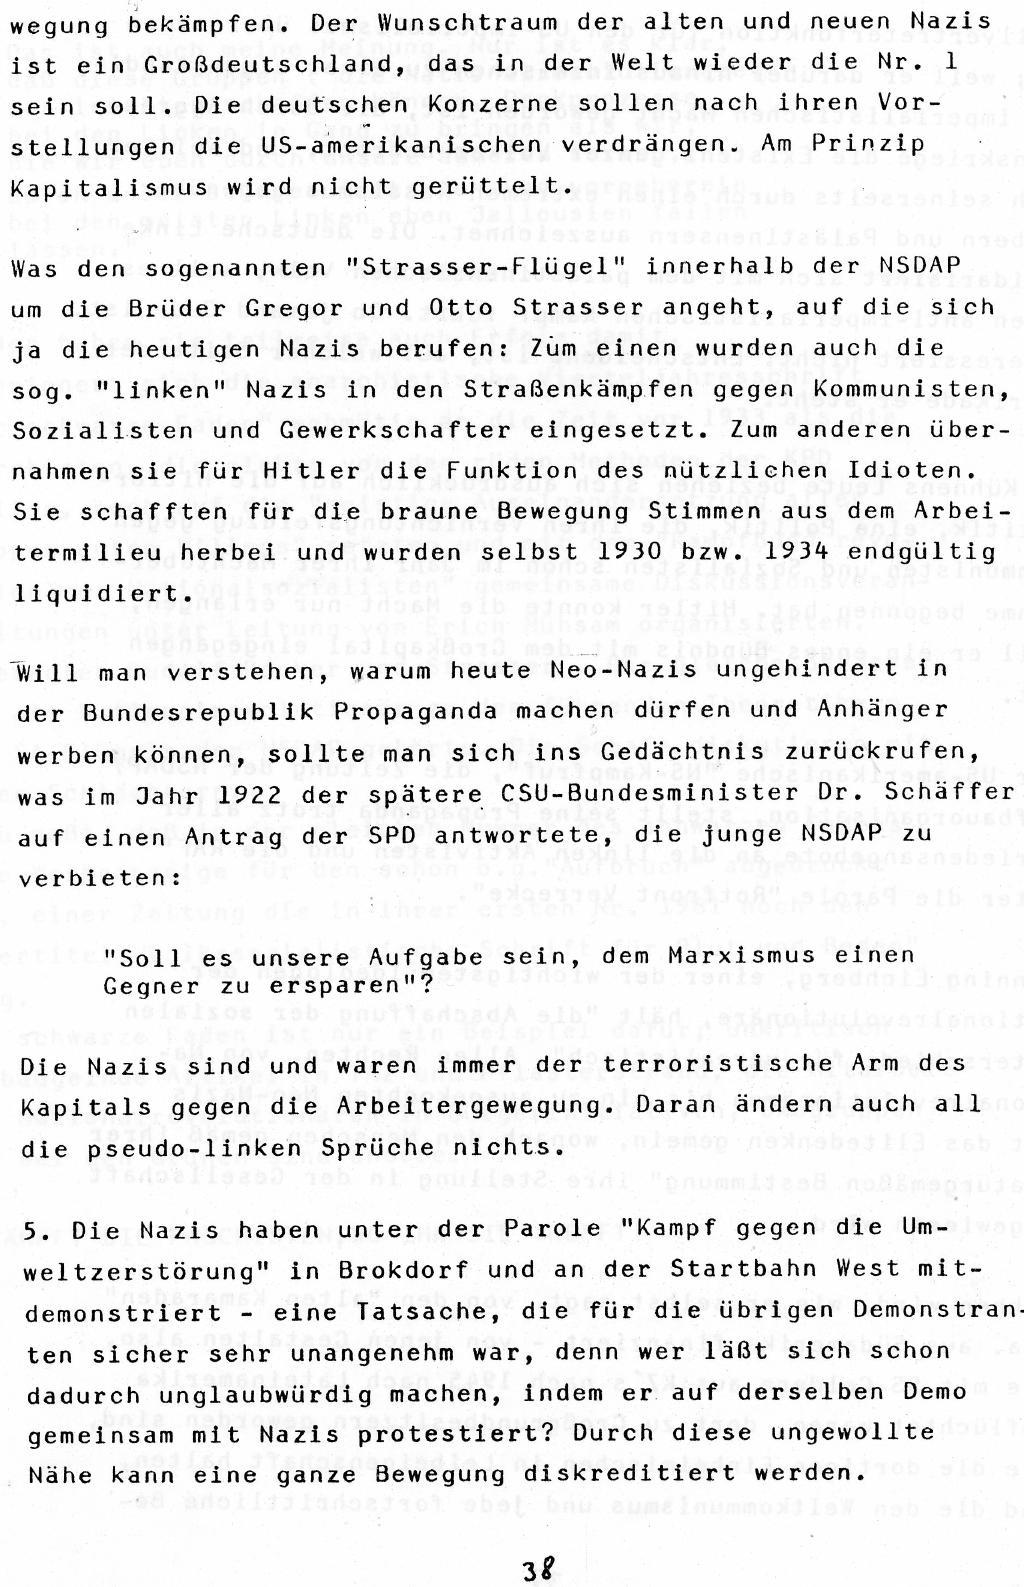 Berlin_1983_Autonome_Gruppen_Faschismus_im_Kapitalismus_38